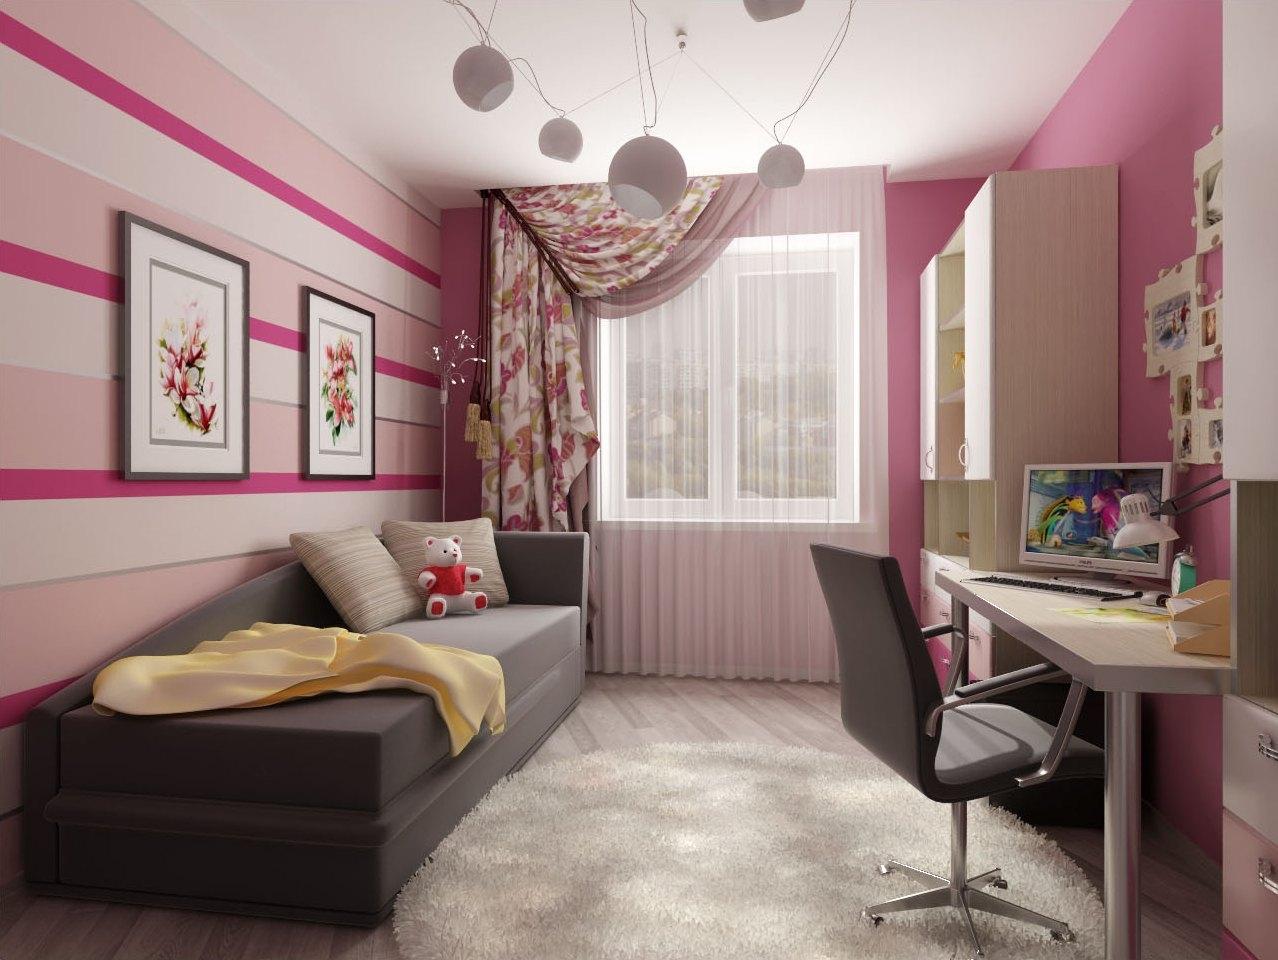 Детская комната: игра и практика